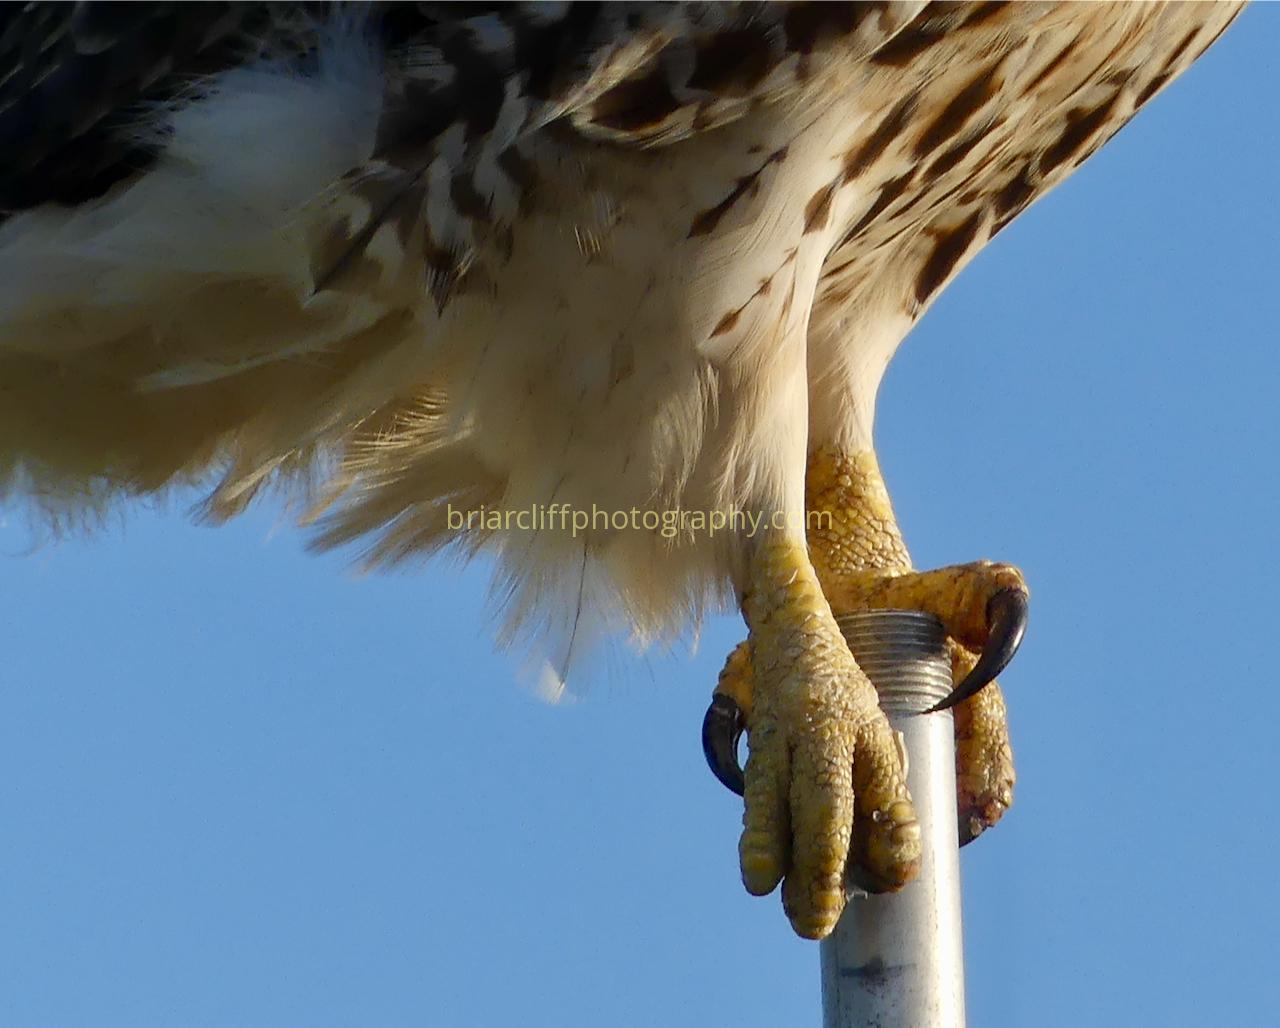 Talon close-up